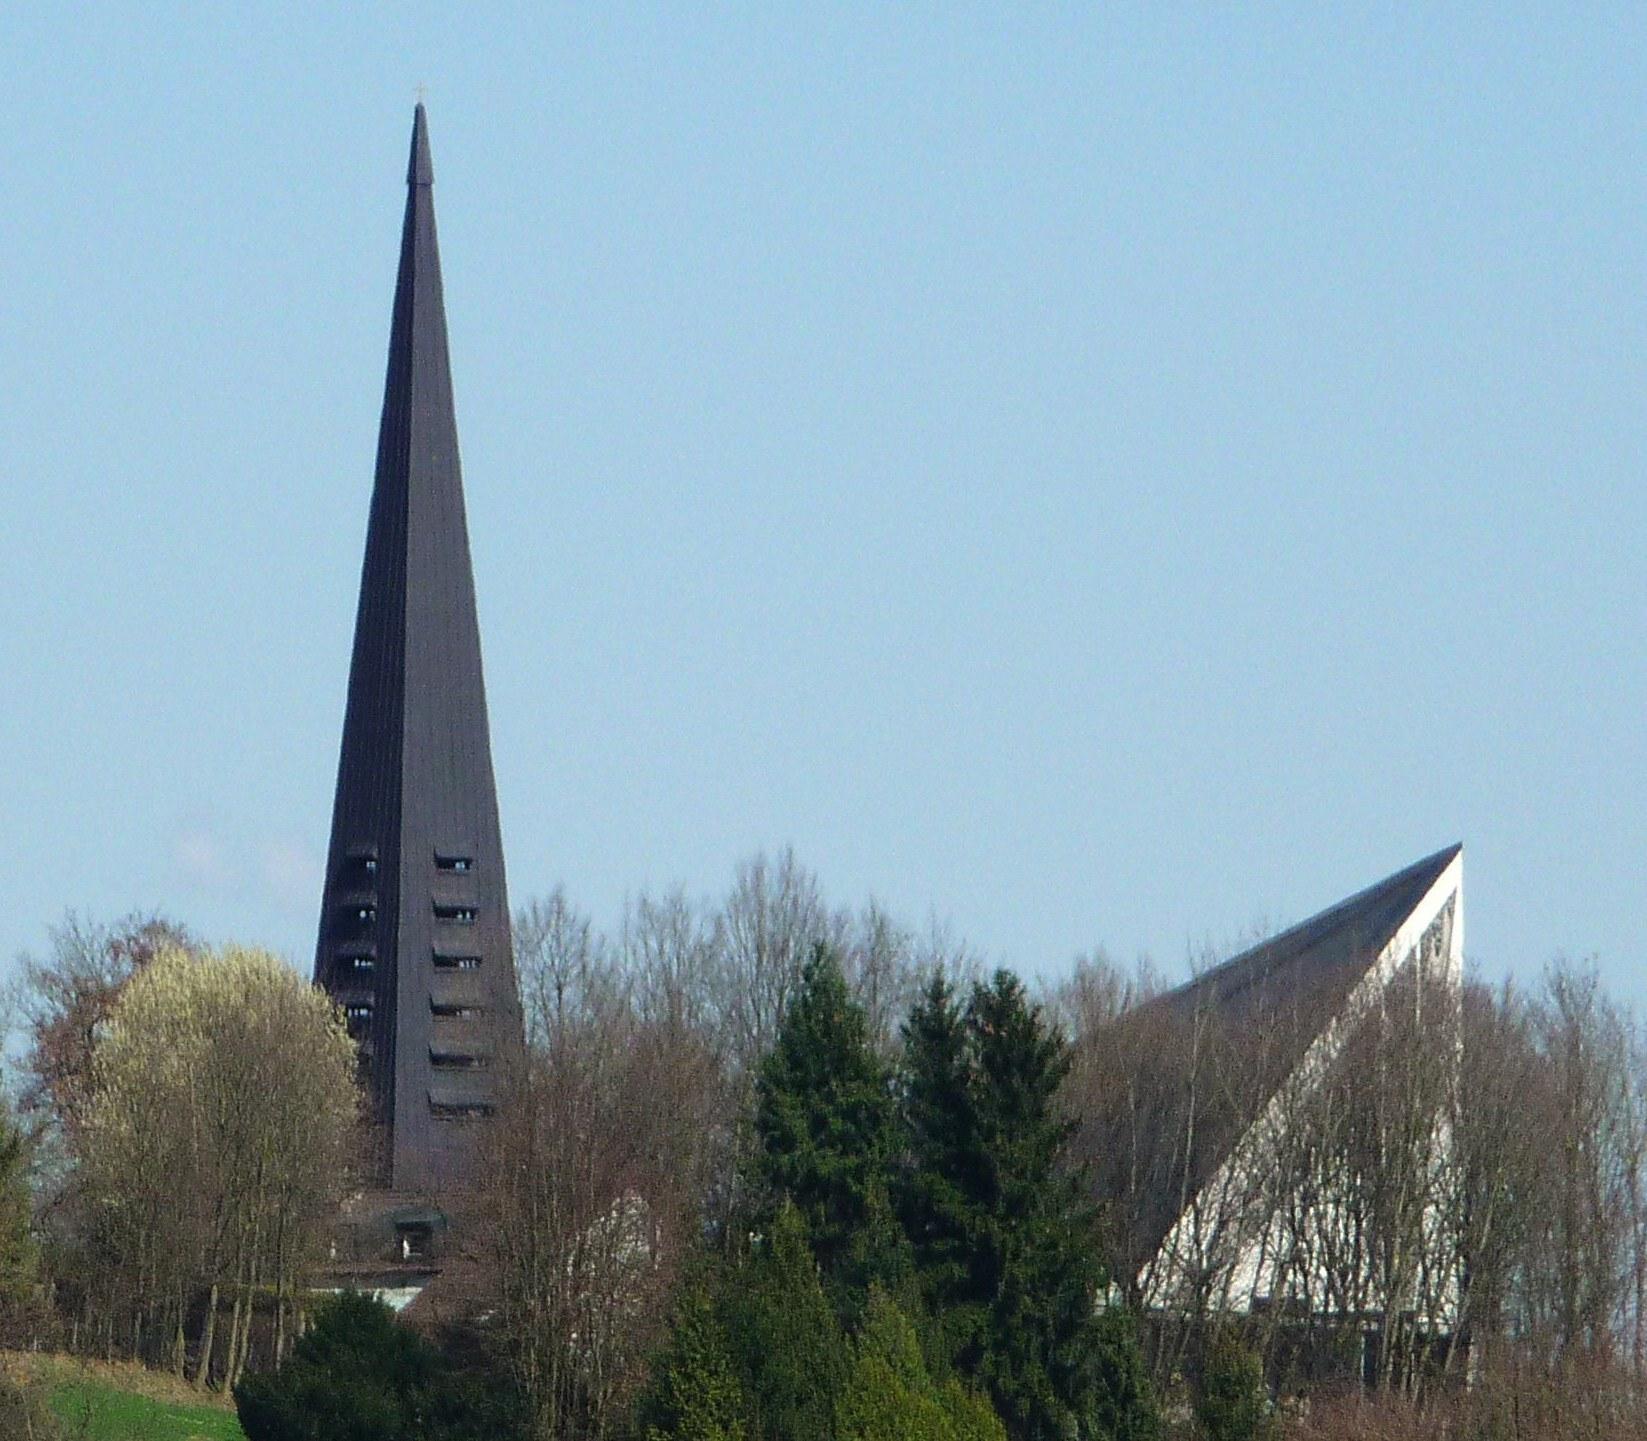 Pfarrkirche Christus der KC3 B6nig Ruhstorf an der Rott